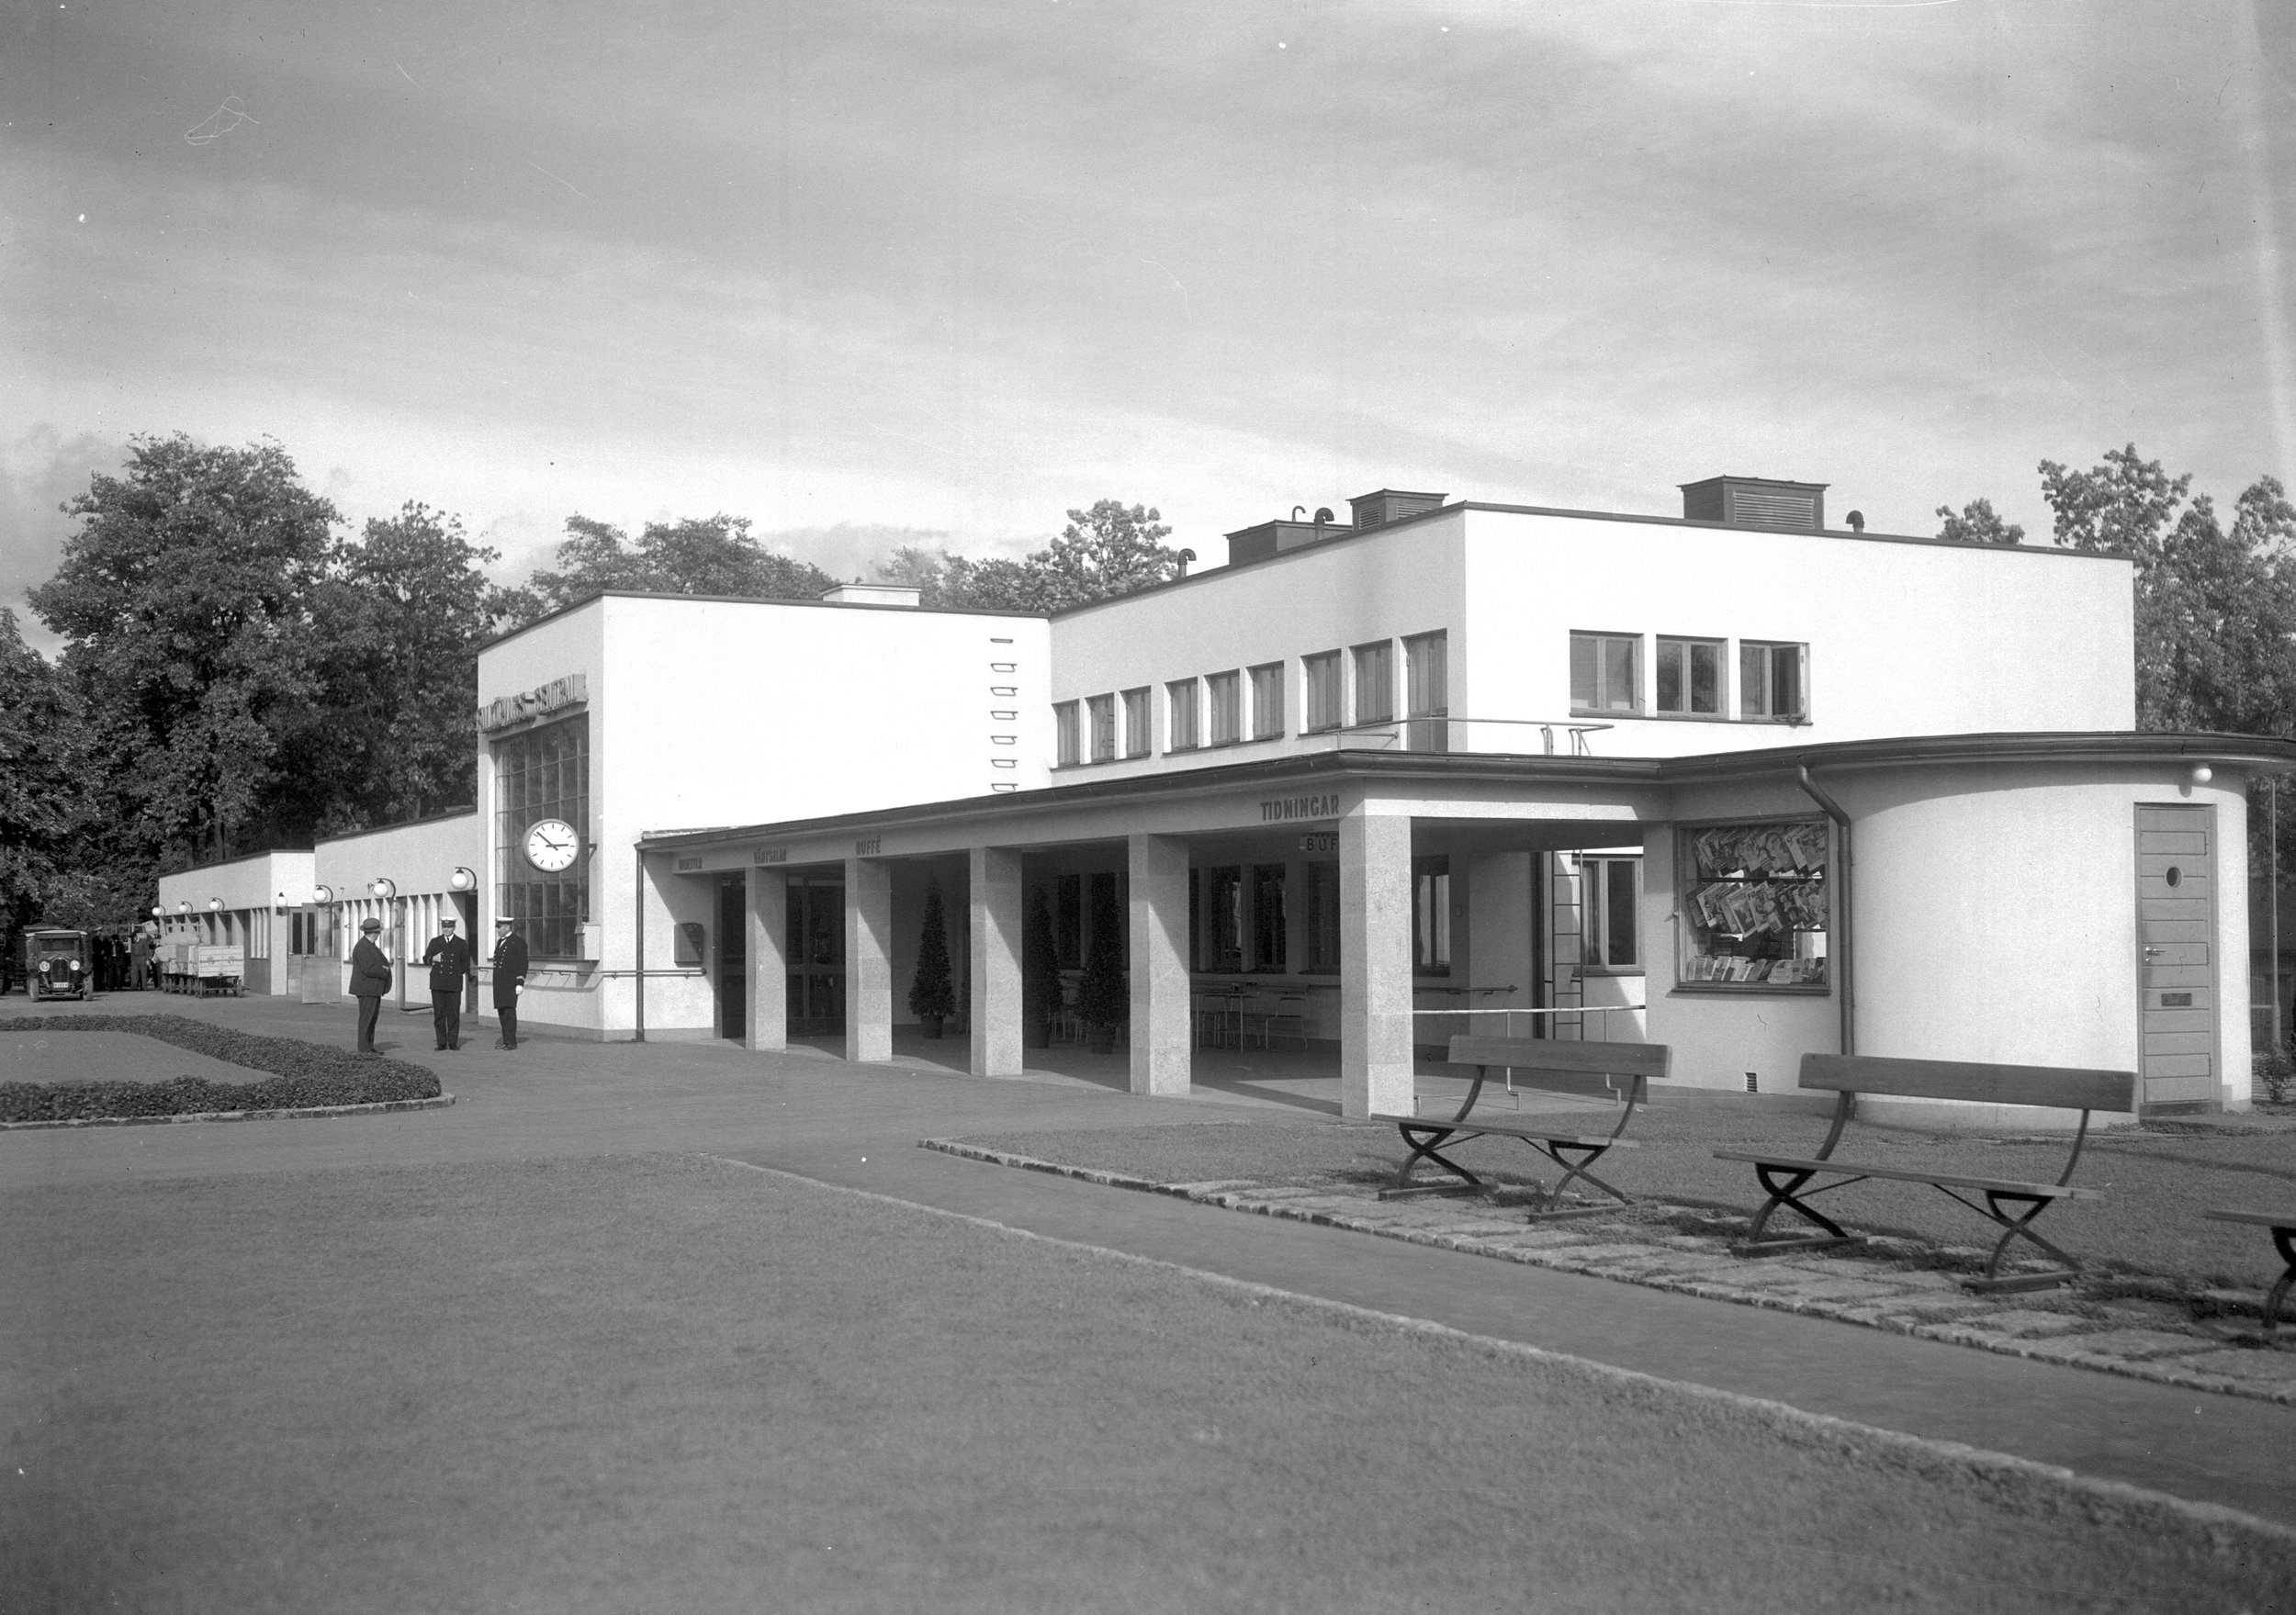 Fotograf: Okänd, Arkivbild Järnvägsmuseet.